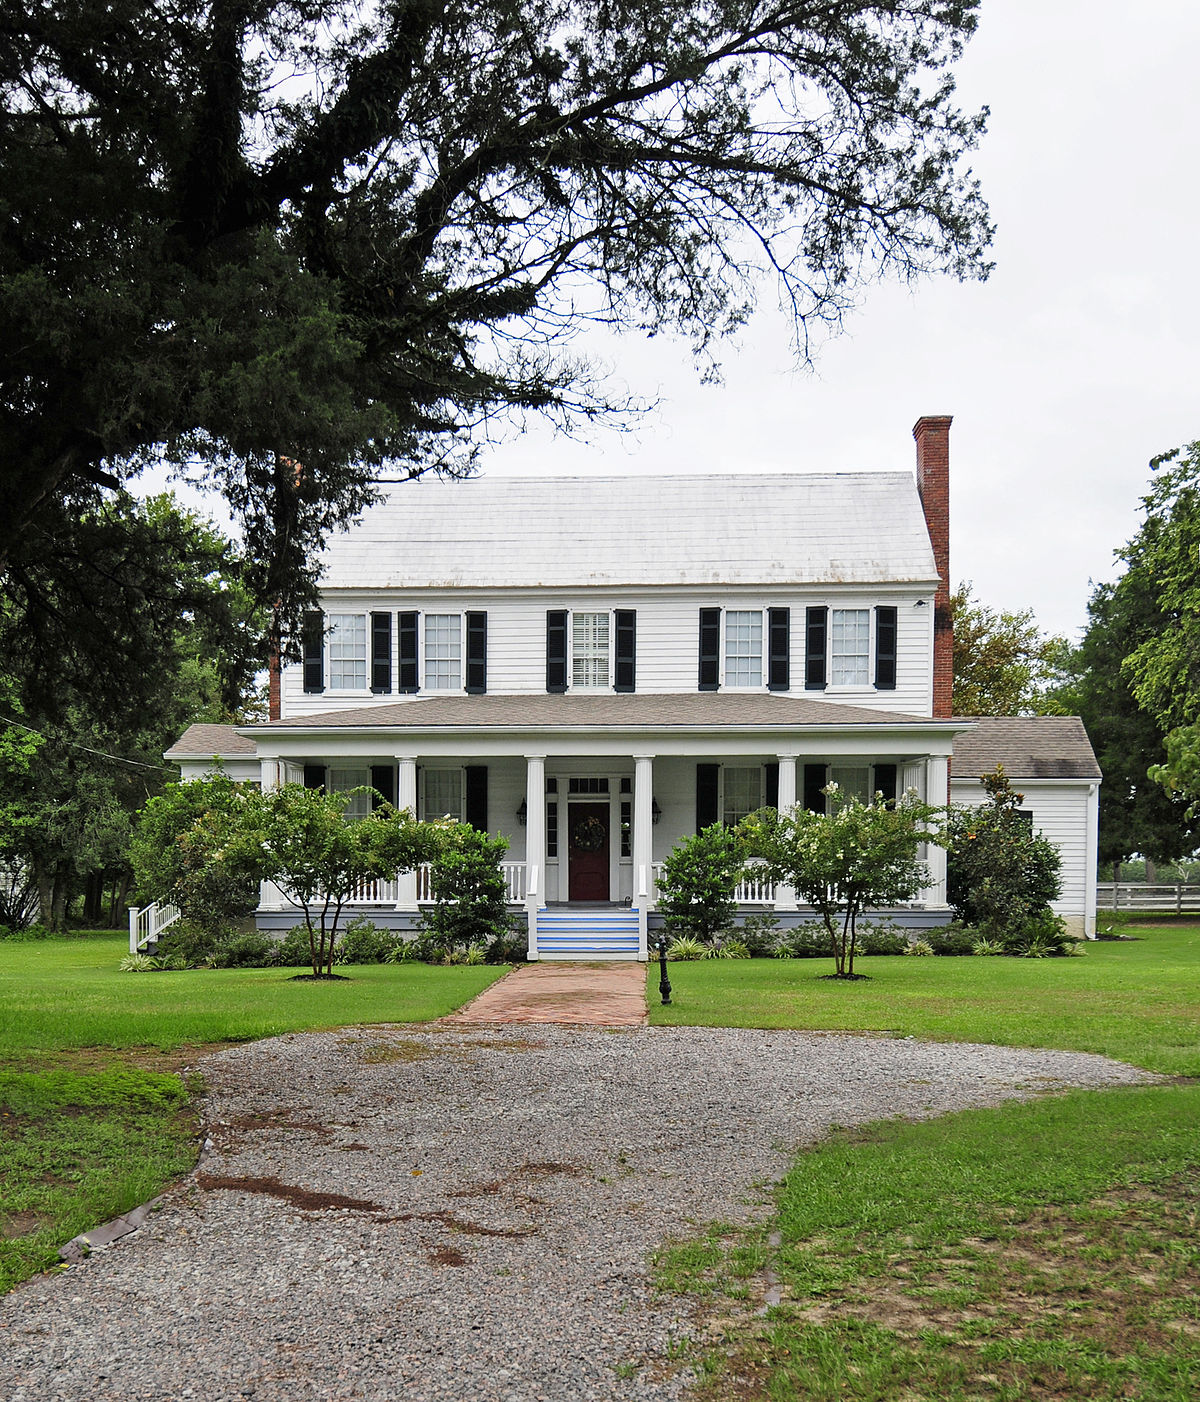 Oakland Plantation Beech Island South Carolina Wikipedia